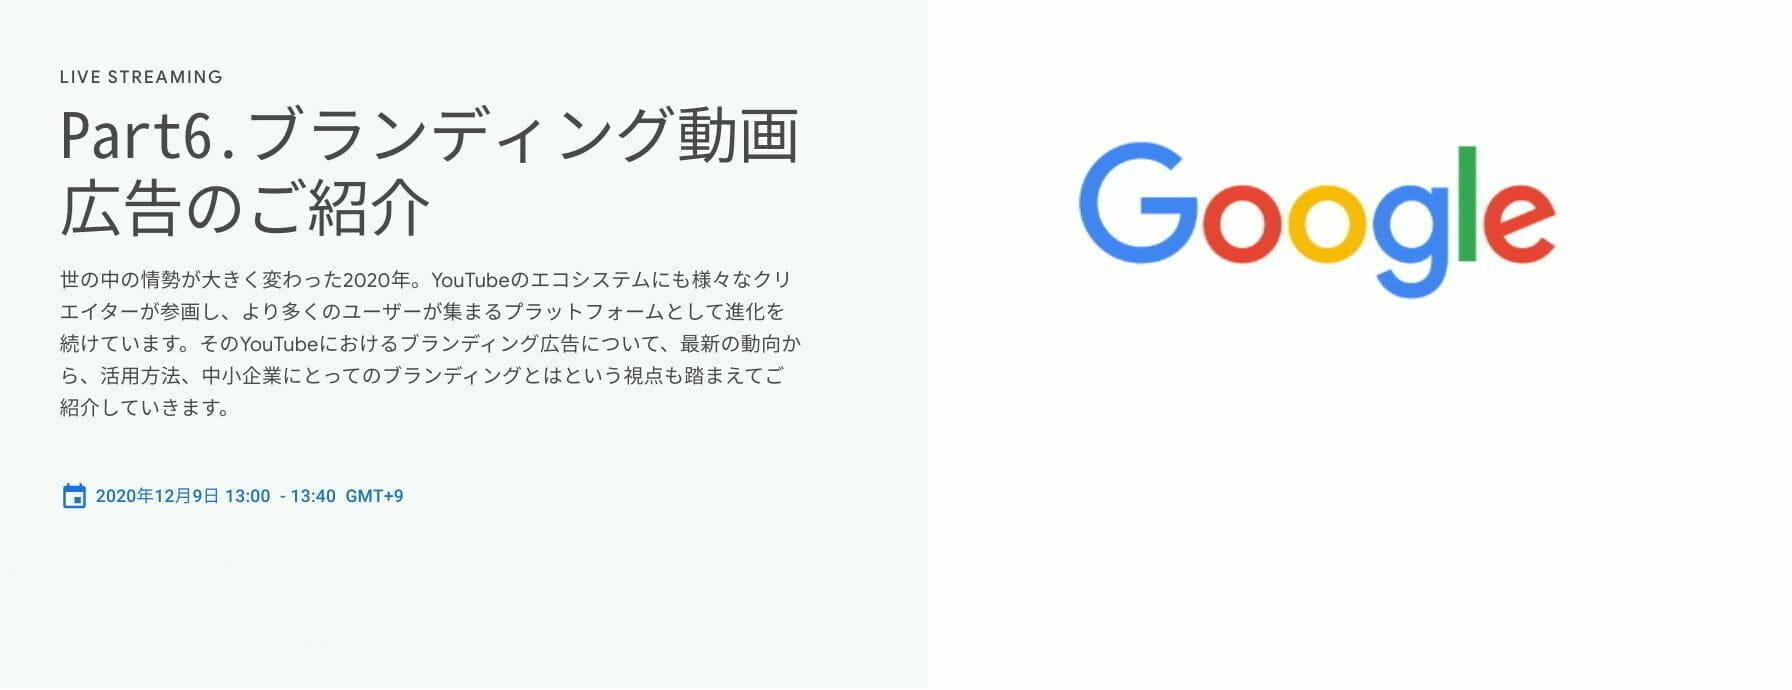 [Google 広告] Part6.ブランディング動画広告のご紹介